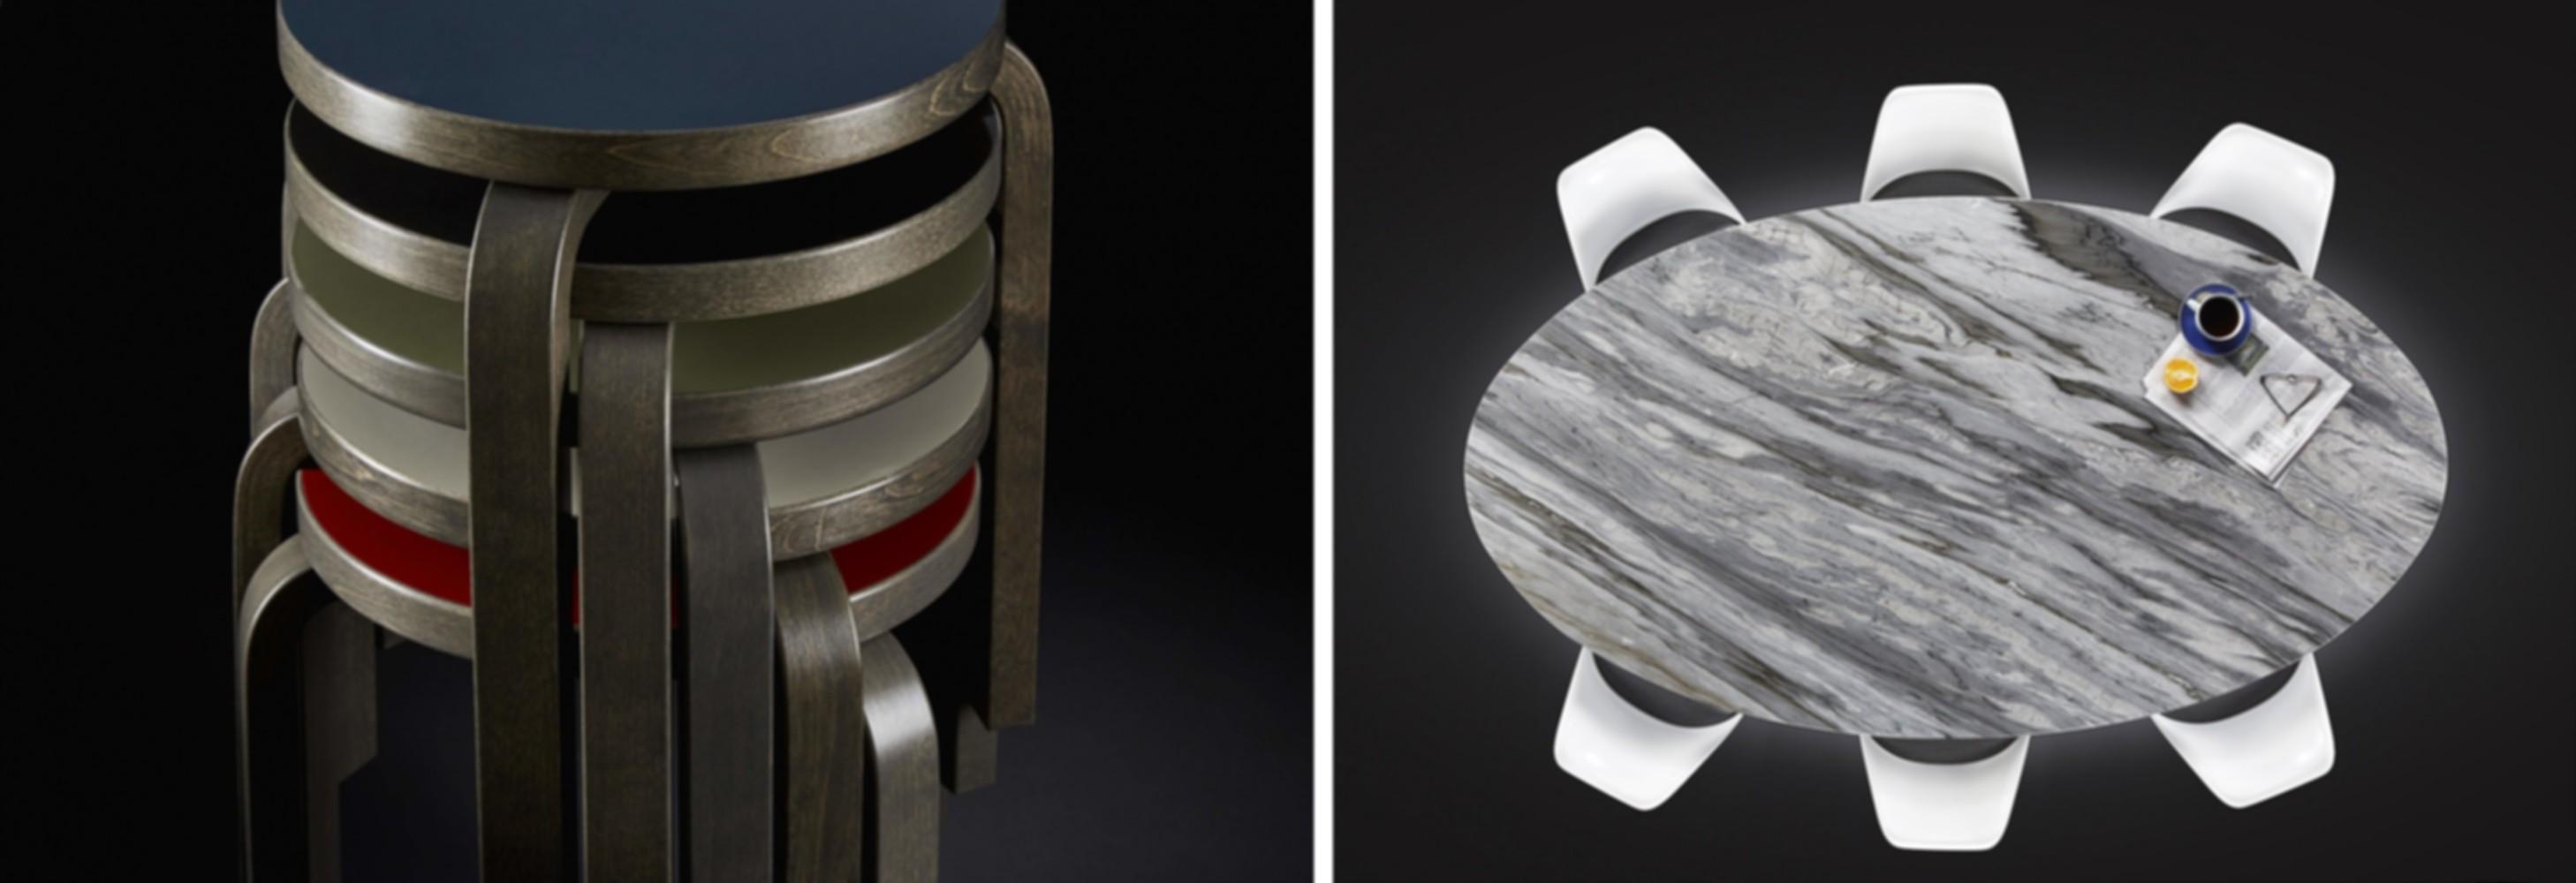 Alvar Aalto's Stool 60 in a grey stain finish | Eero Saarinen's Pedestal Table in a Calacatta Cielo marble finish